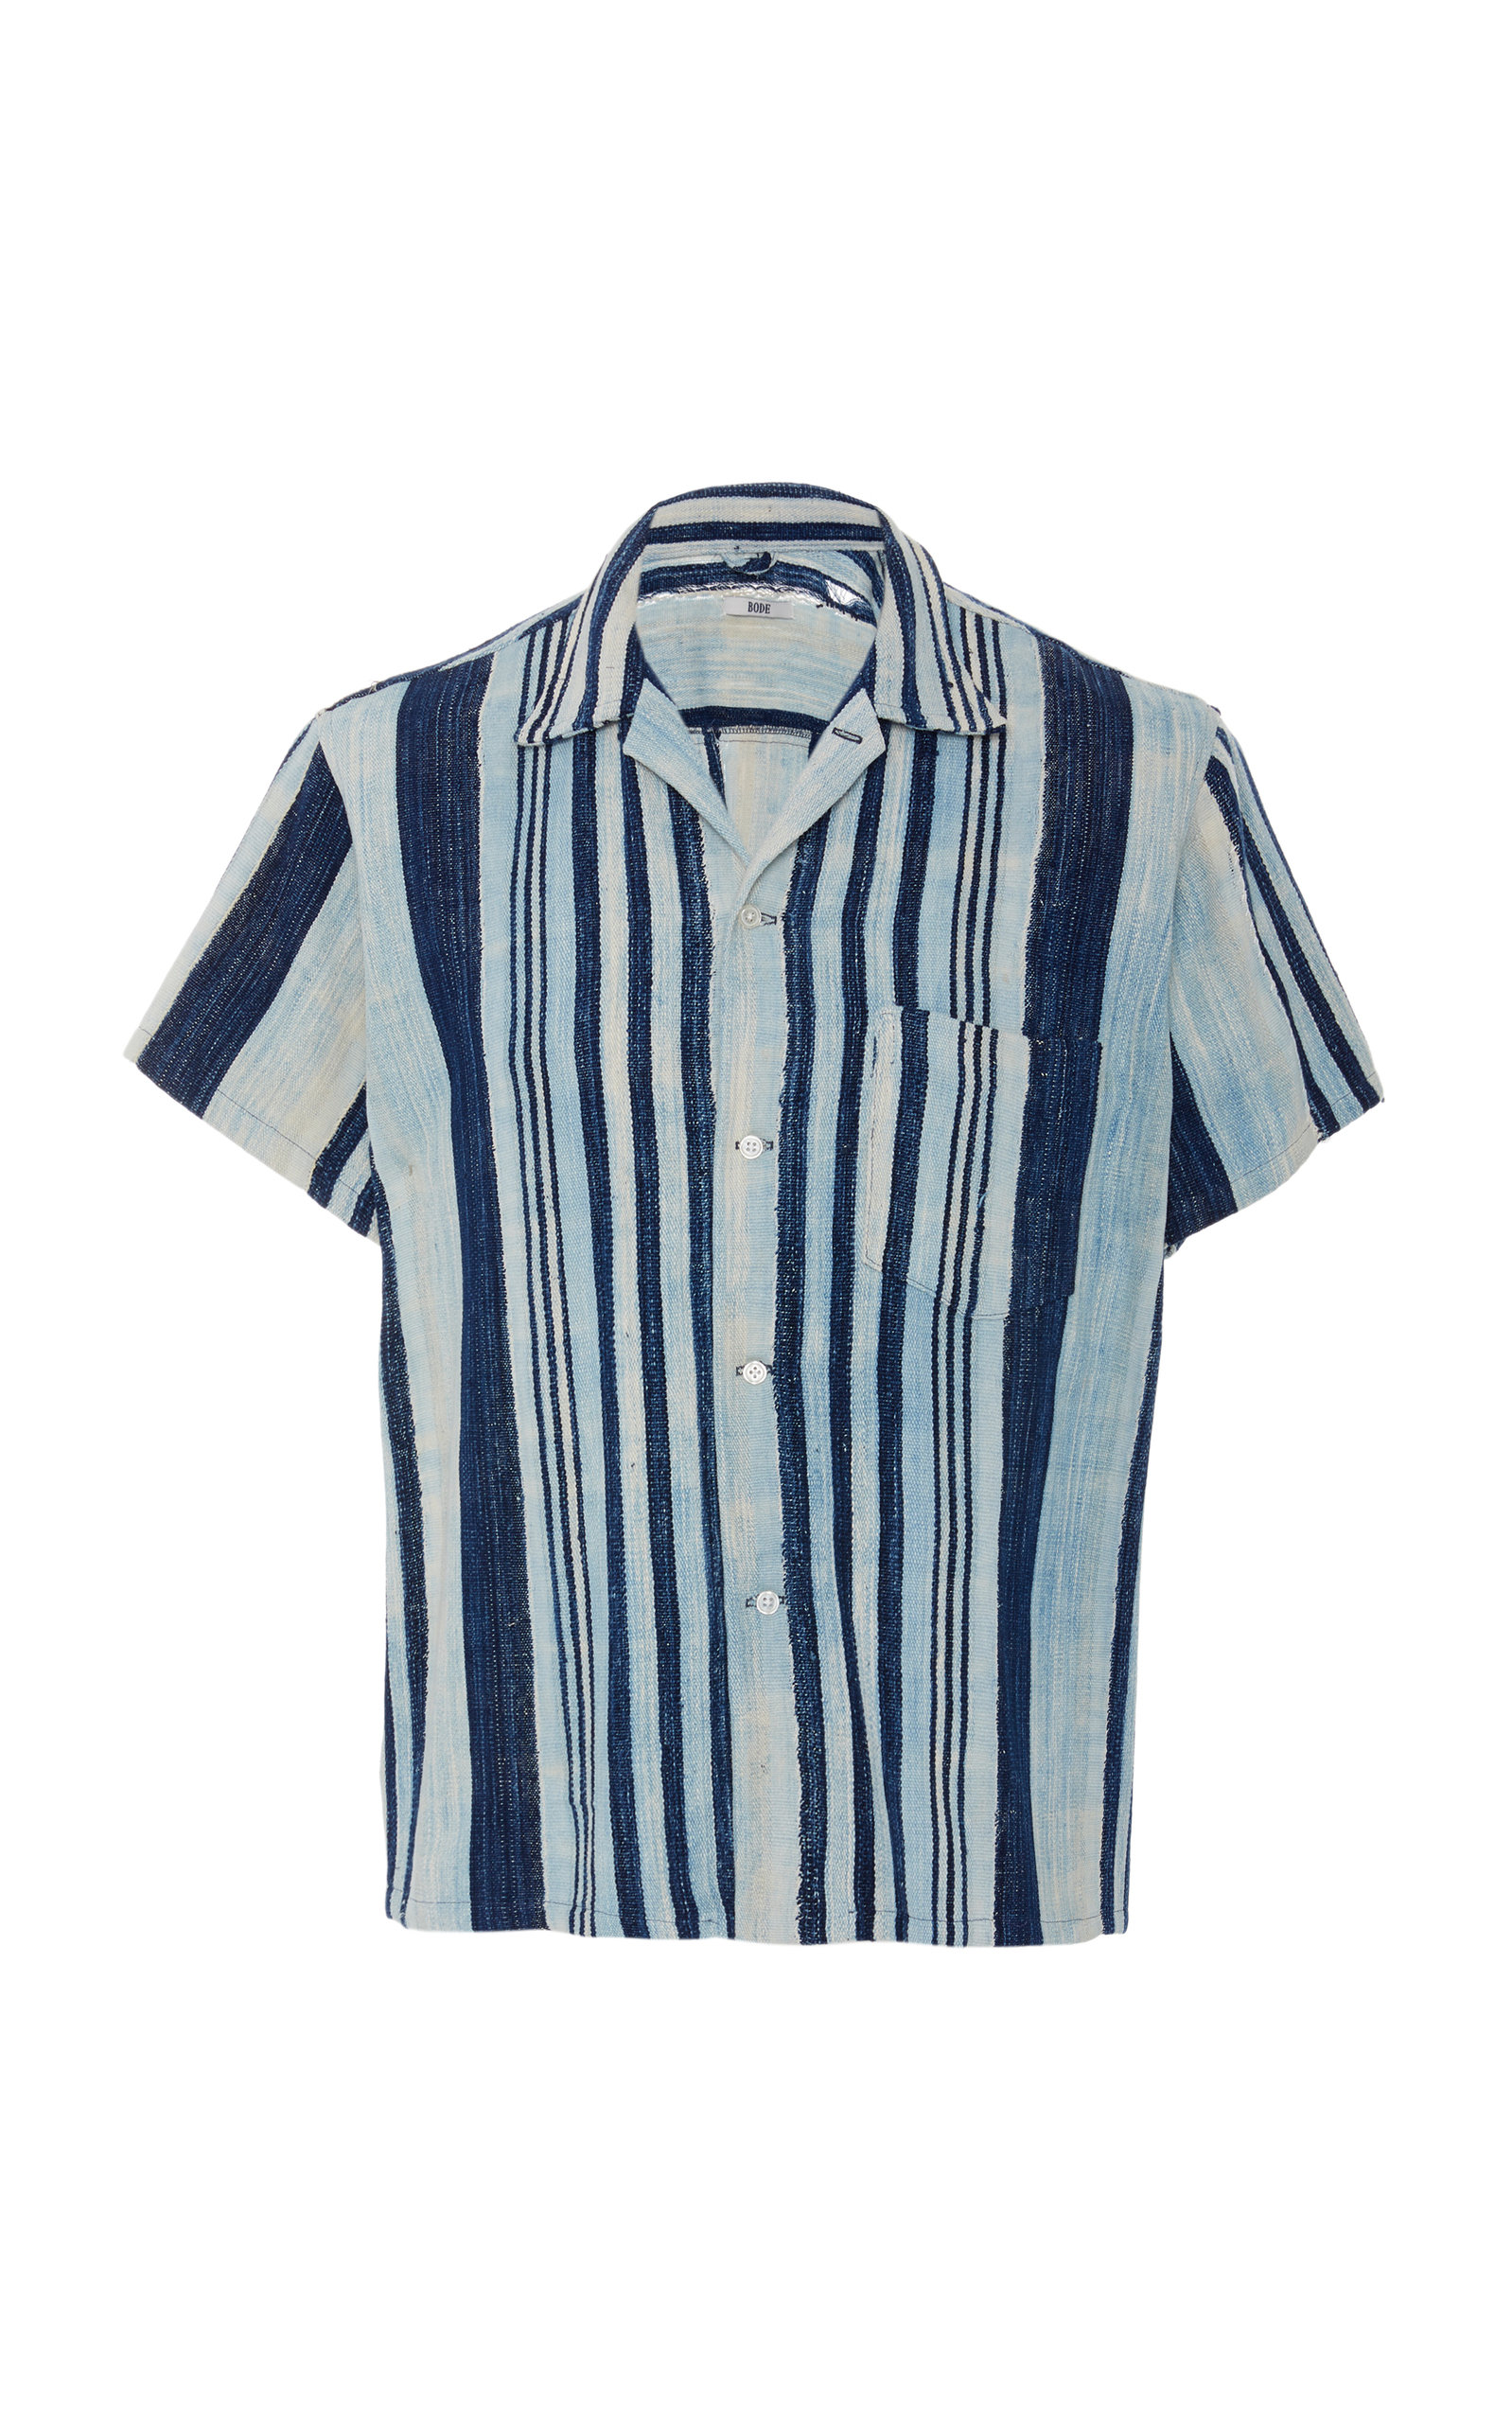 23f31633a0af7 Striped Cotton Bowling Shirt